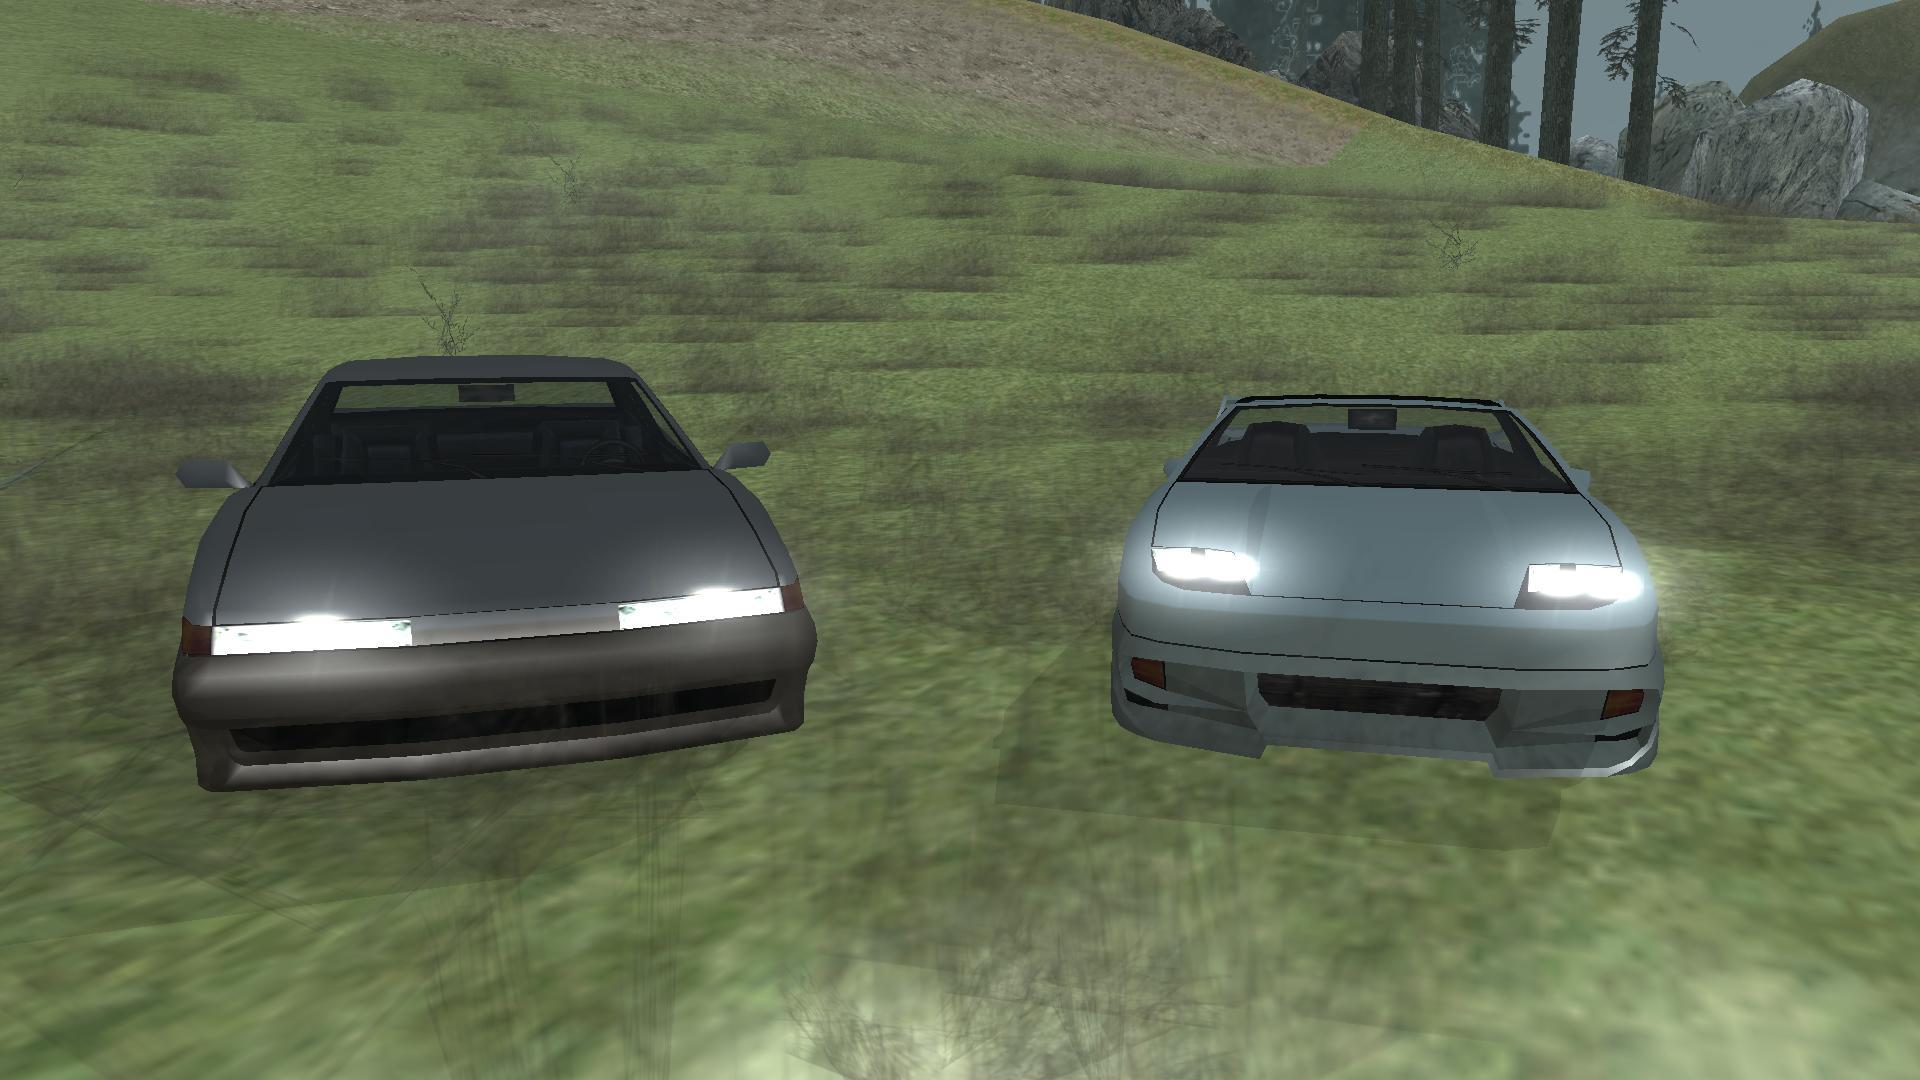 gallery8.jpg - Grand Theft Auto: San Andreas